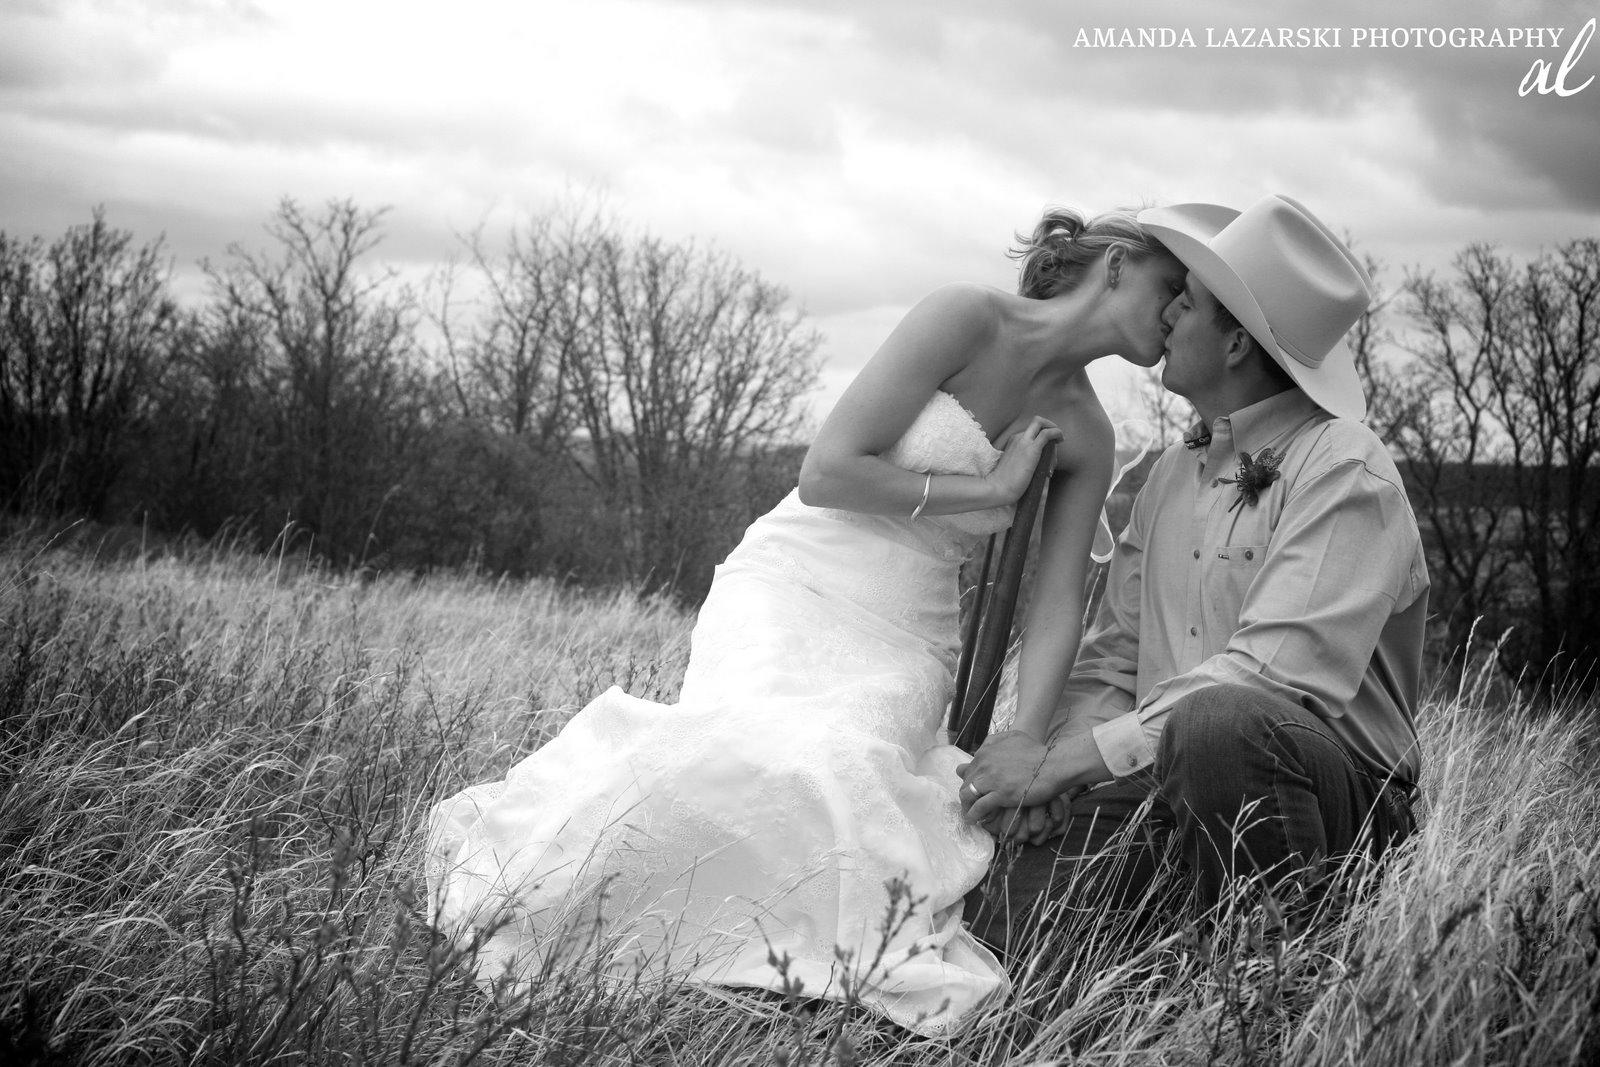 Amanda Lazarski Photography